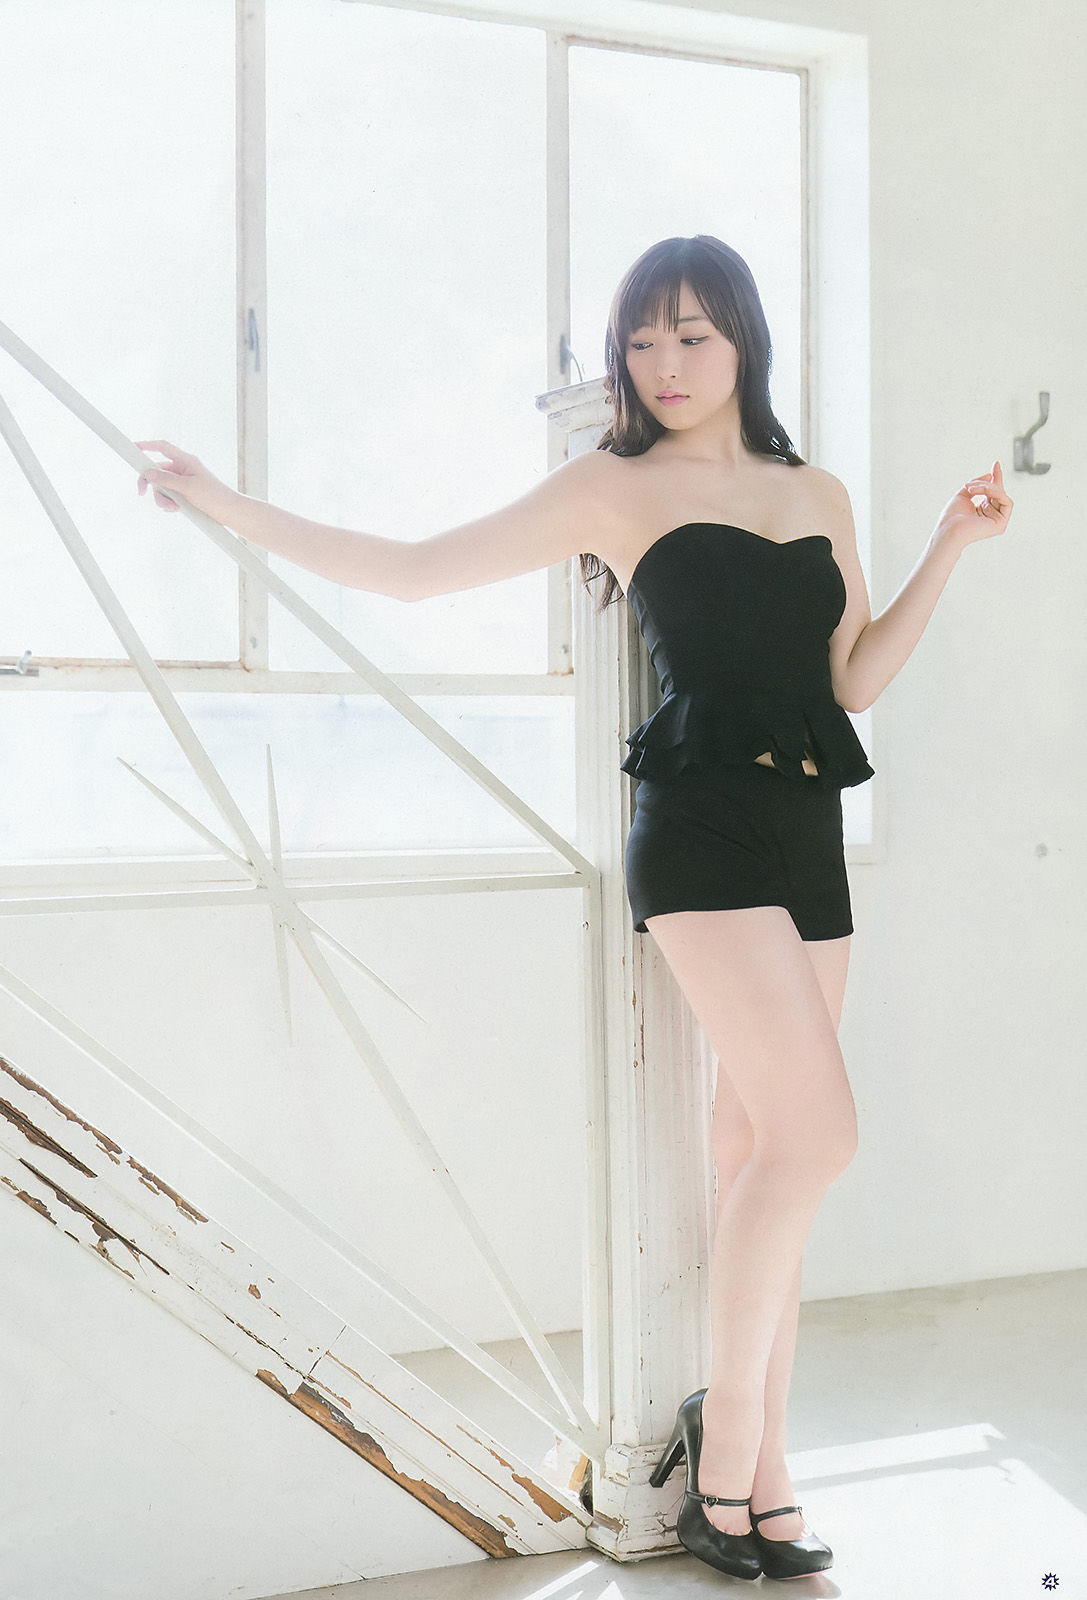 VOL.107 [Young Gangan]女神日本嫩模:谱久村圣超高清写真套图(31P)